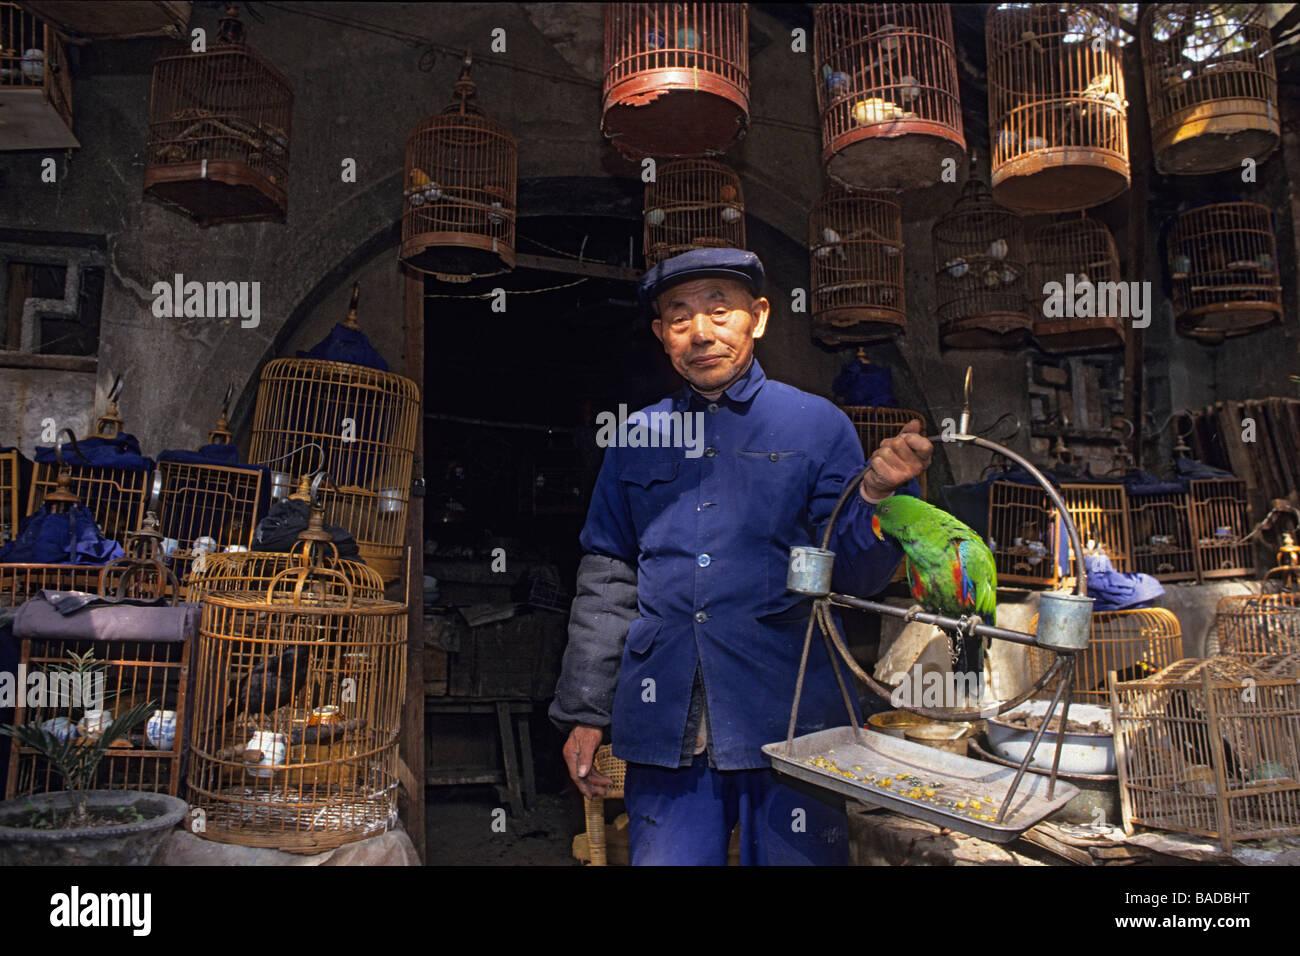 Chine, Jiangsu province, Nanjing, Confucius temple district, Birds market, salseman presenting a parrot - Stock Image